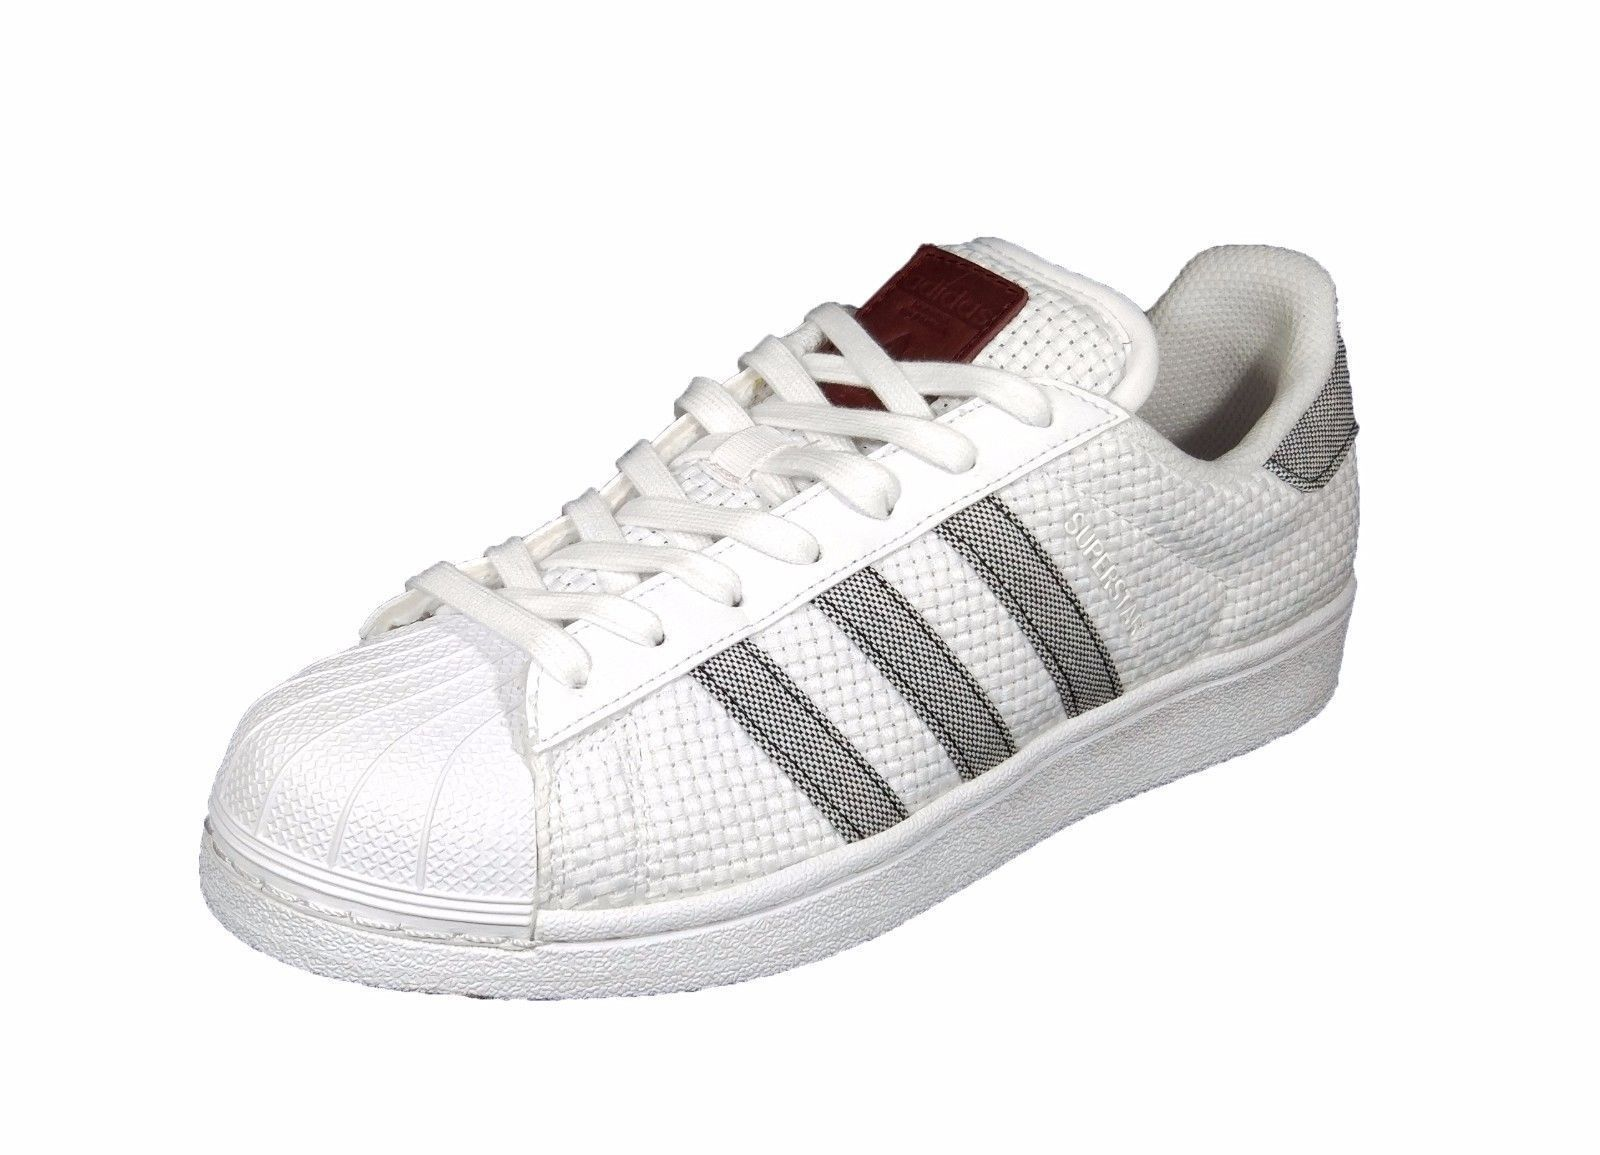 Adidas Originals Superstar Riviera Mens and 21 similar items